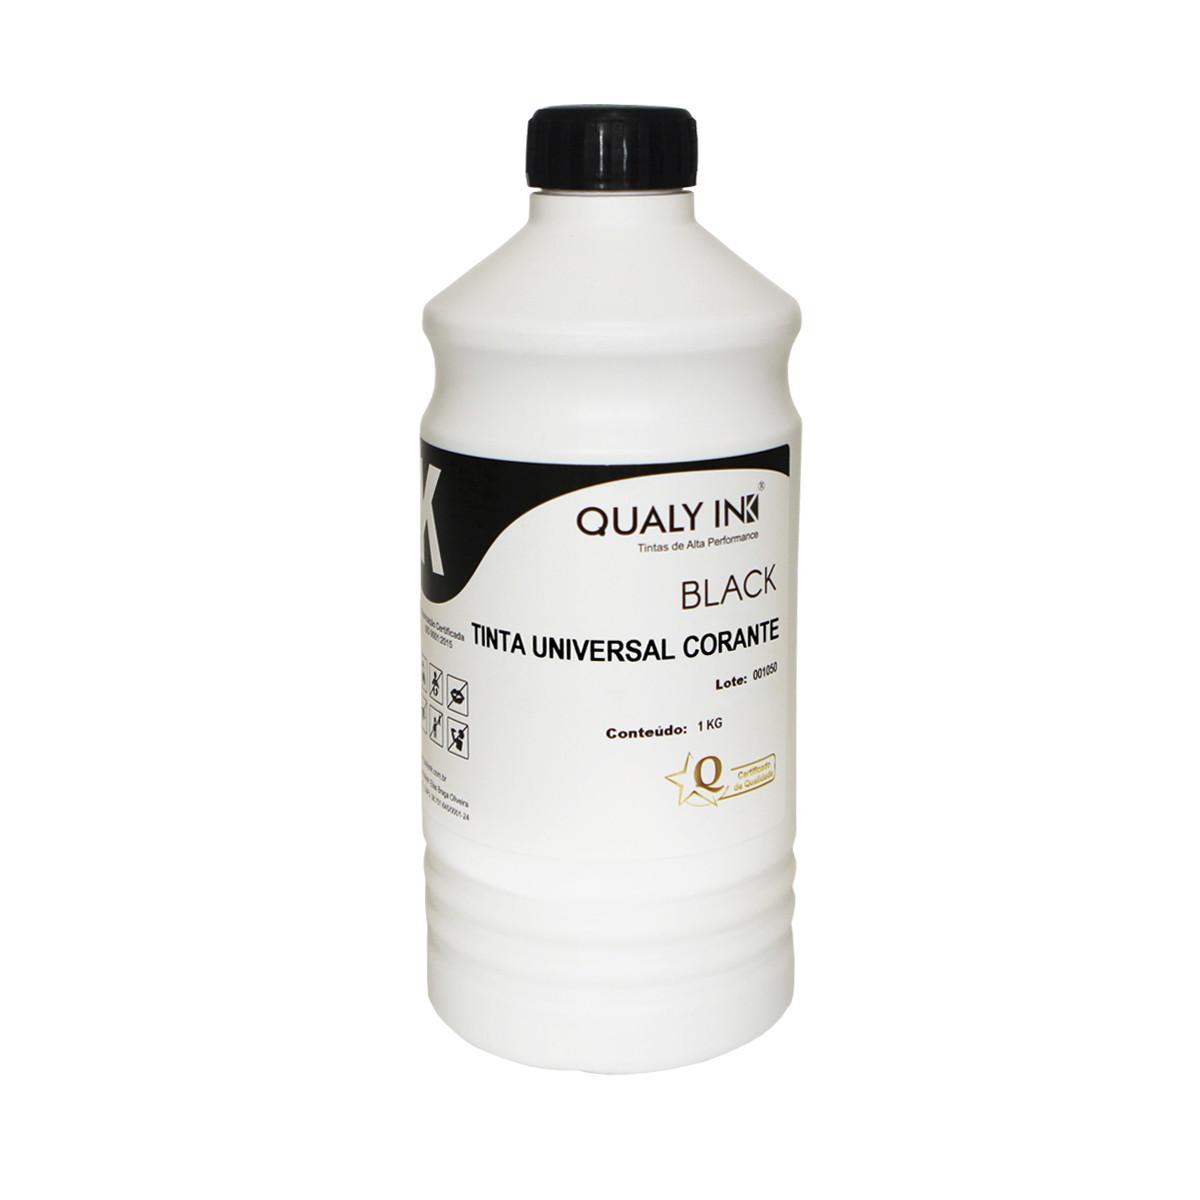 Tinta HP Universal Preto Corante 919400001 | Qualy Ink 1kg